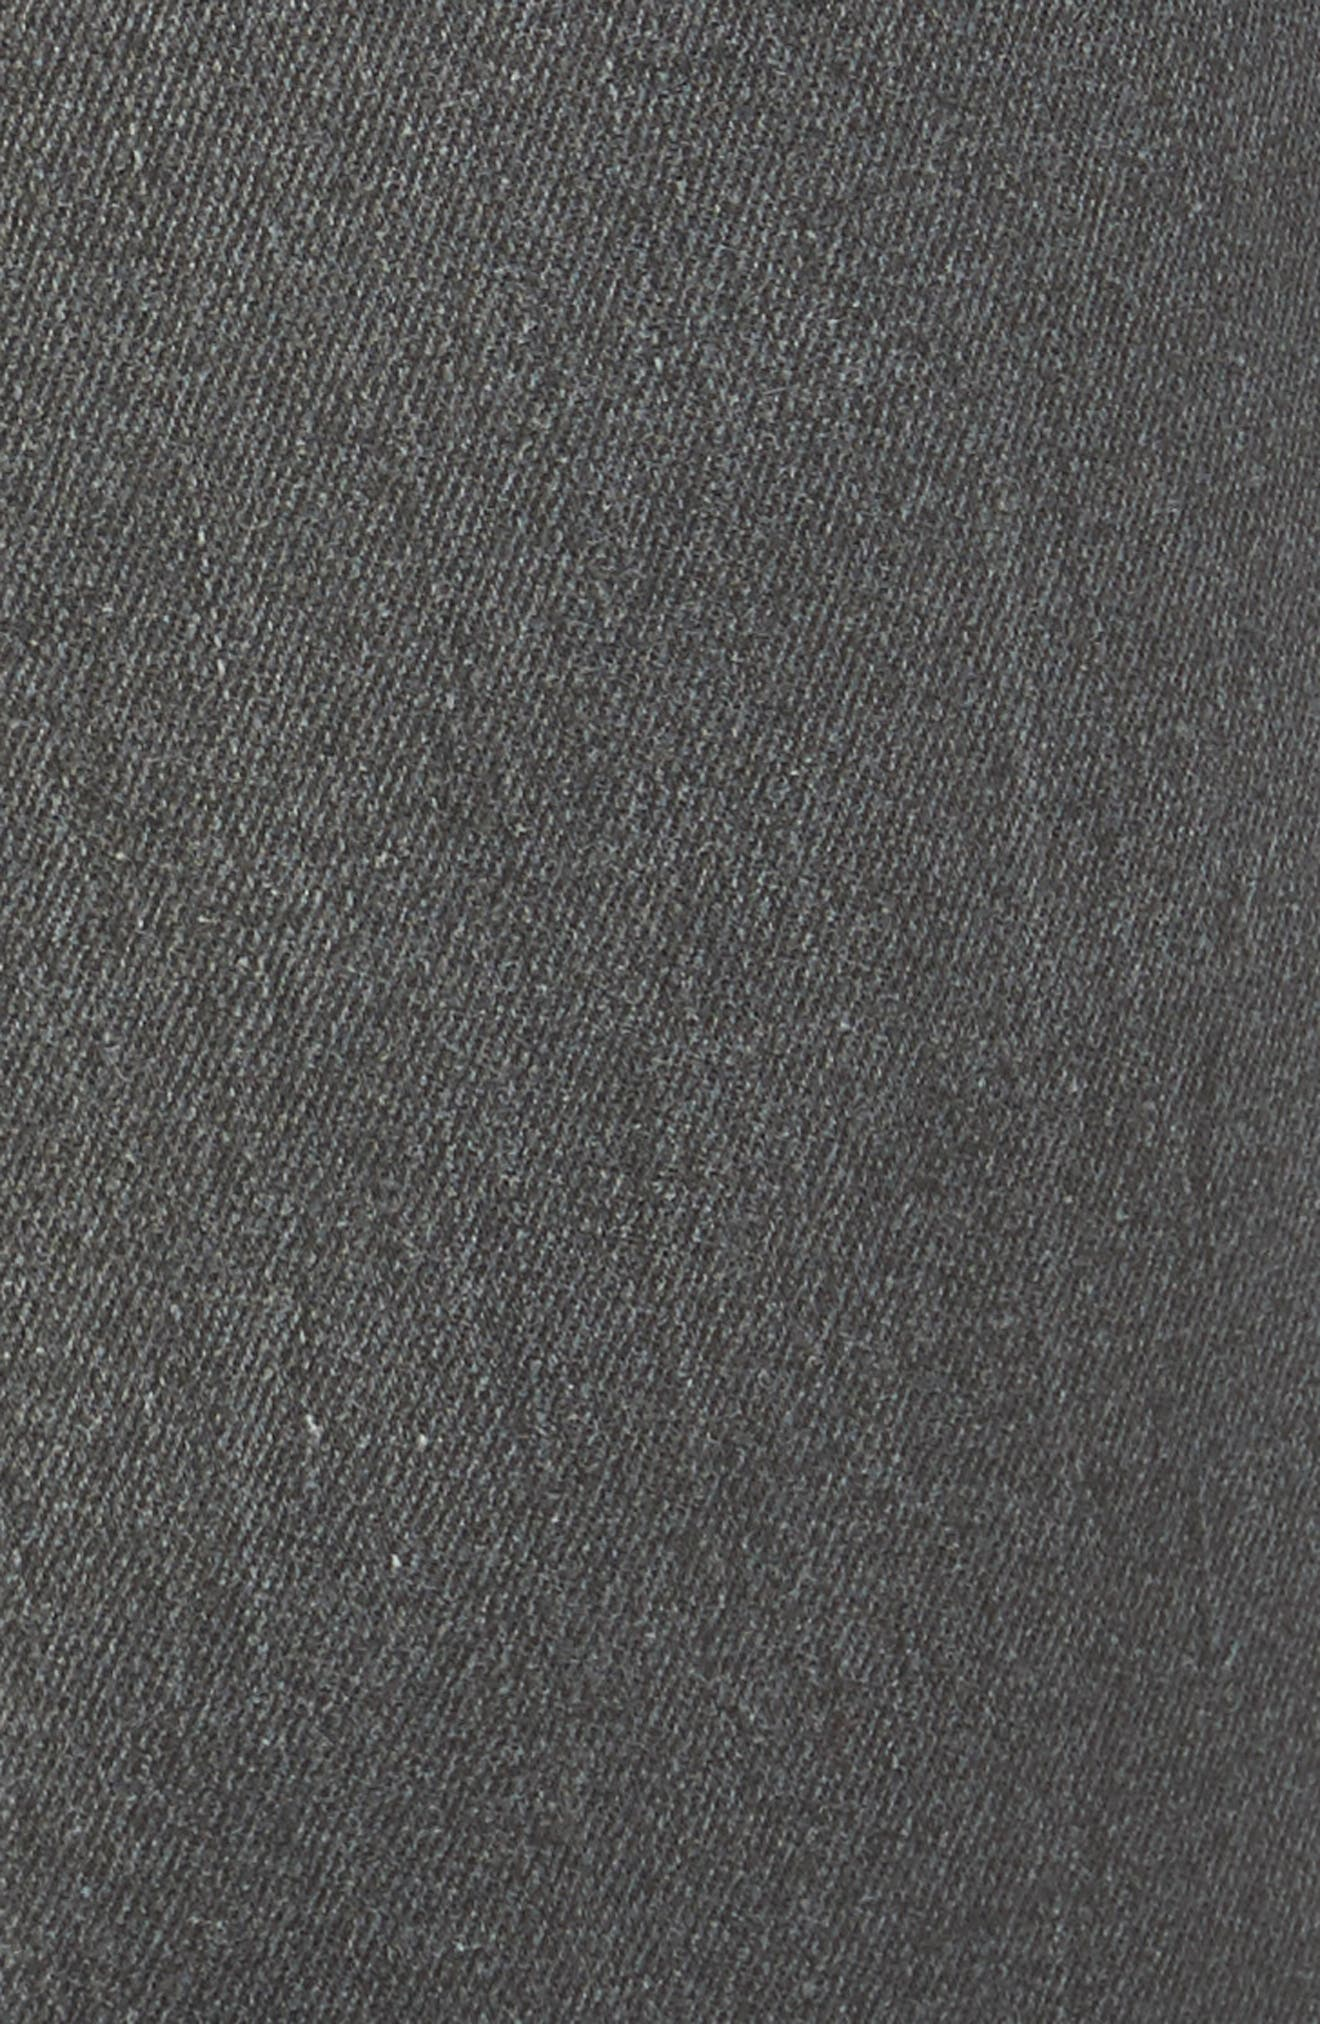 Rock Star Studded Skinny Jeans,                             Alternate thumbnail 5, color,